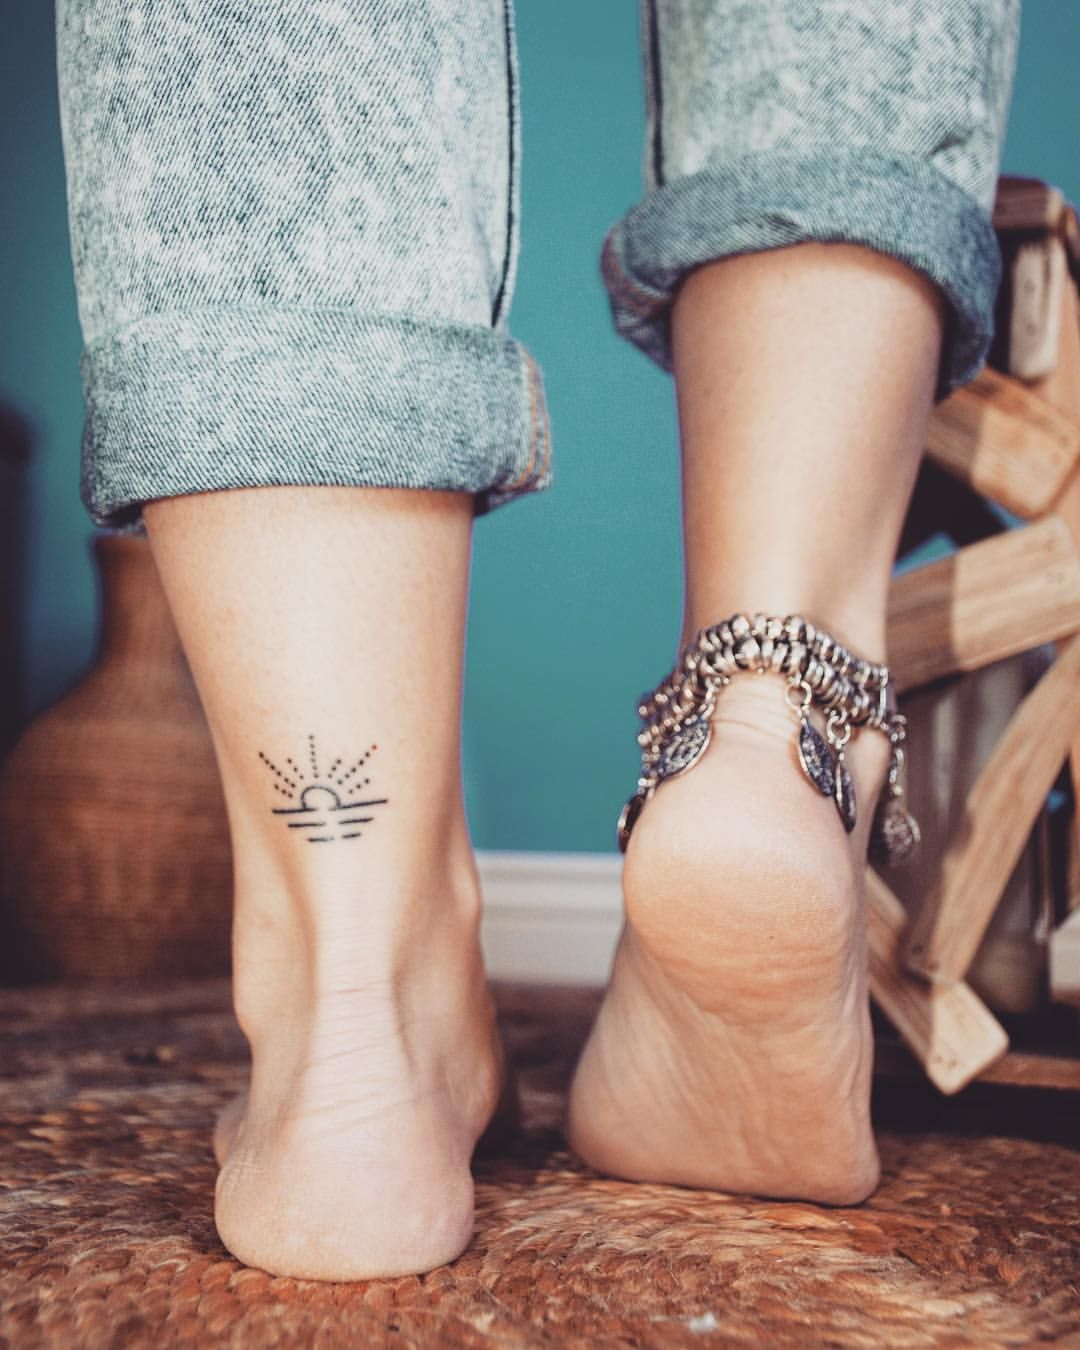 Waiting for the summer like ... #tattoo #tattoos #inspiration #smalltattoos #sun #sunset #sea #summer #theme #idea #travel #photography…